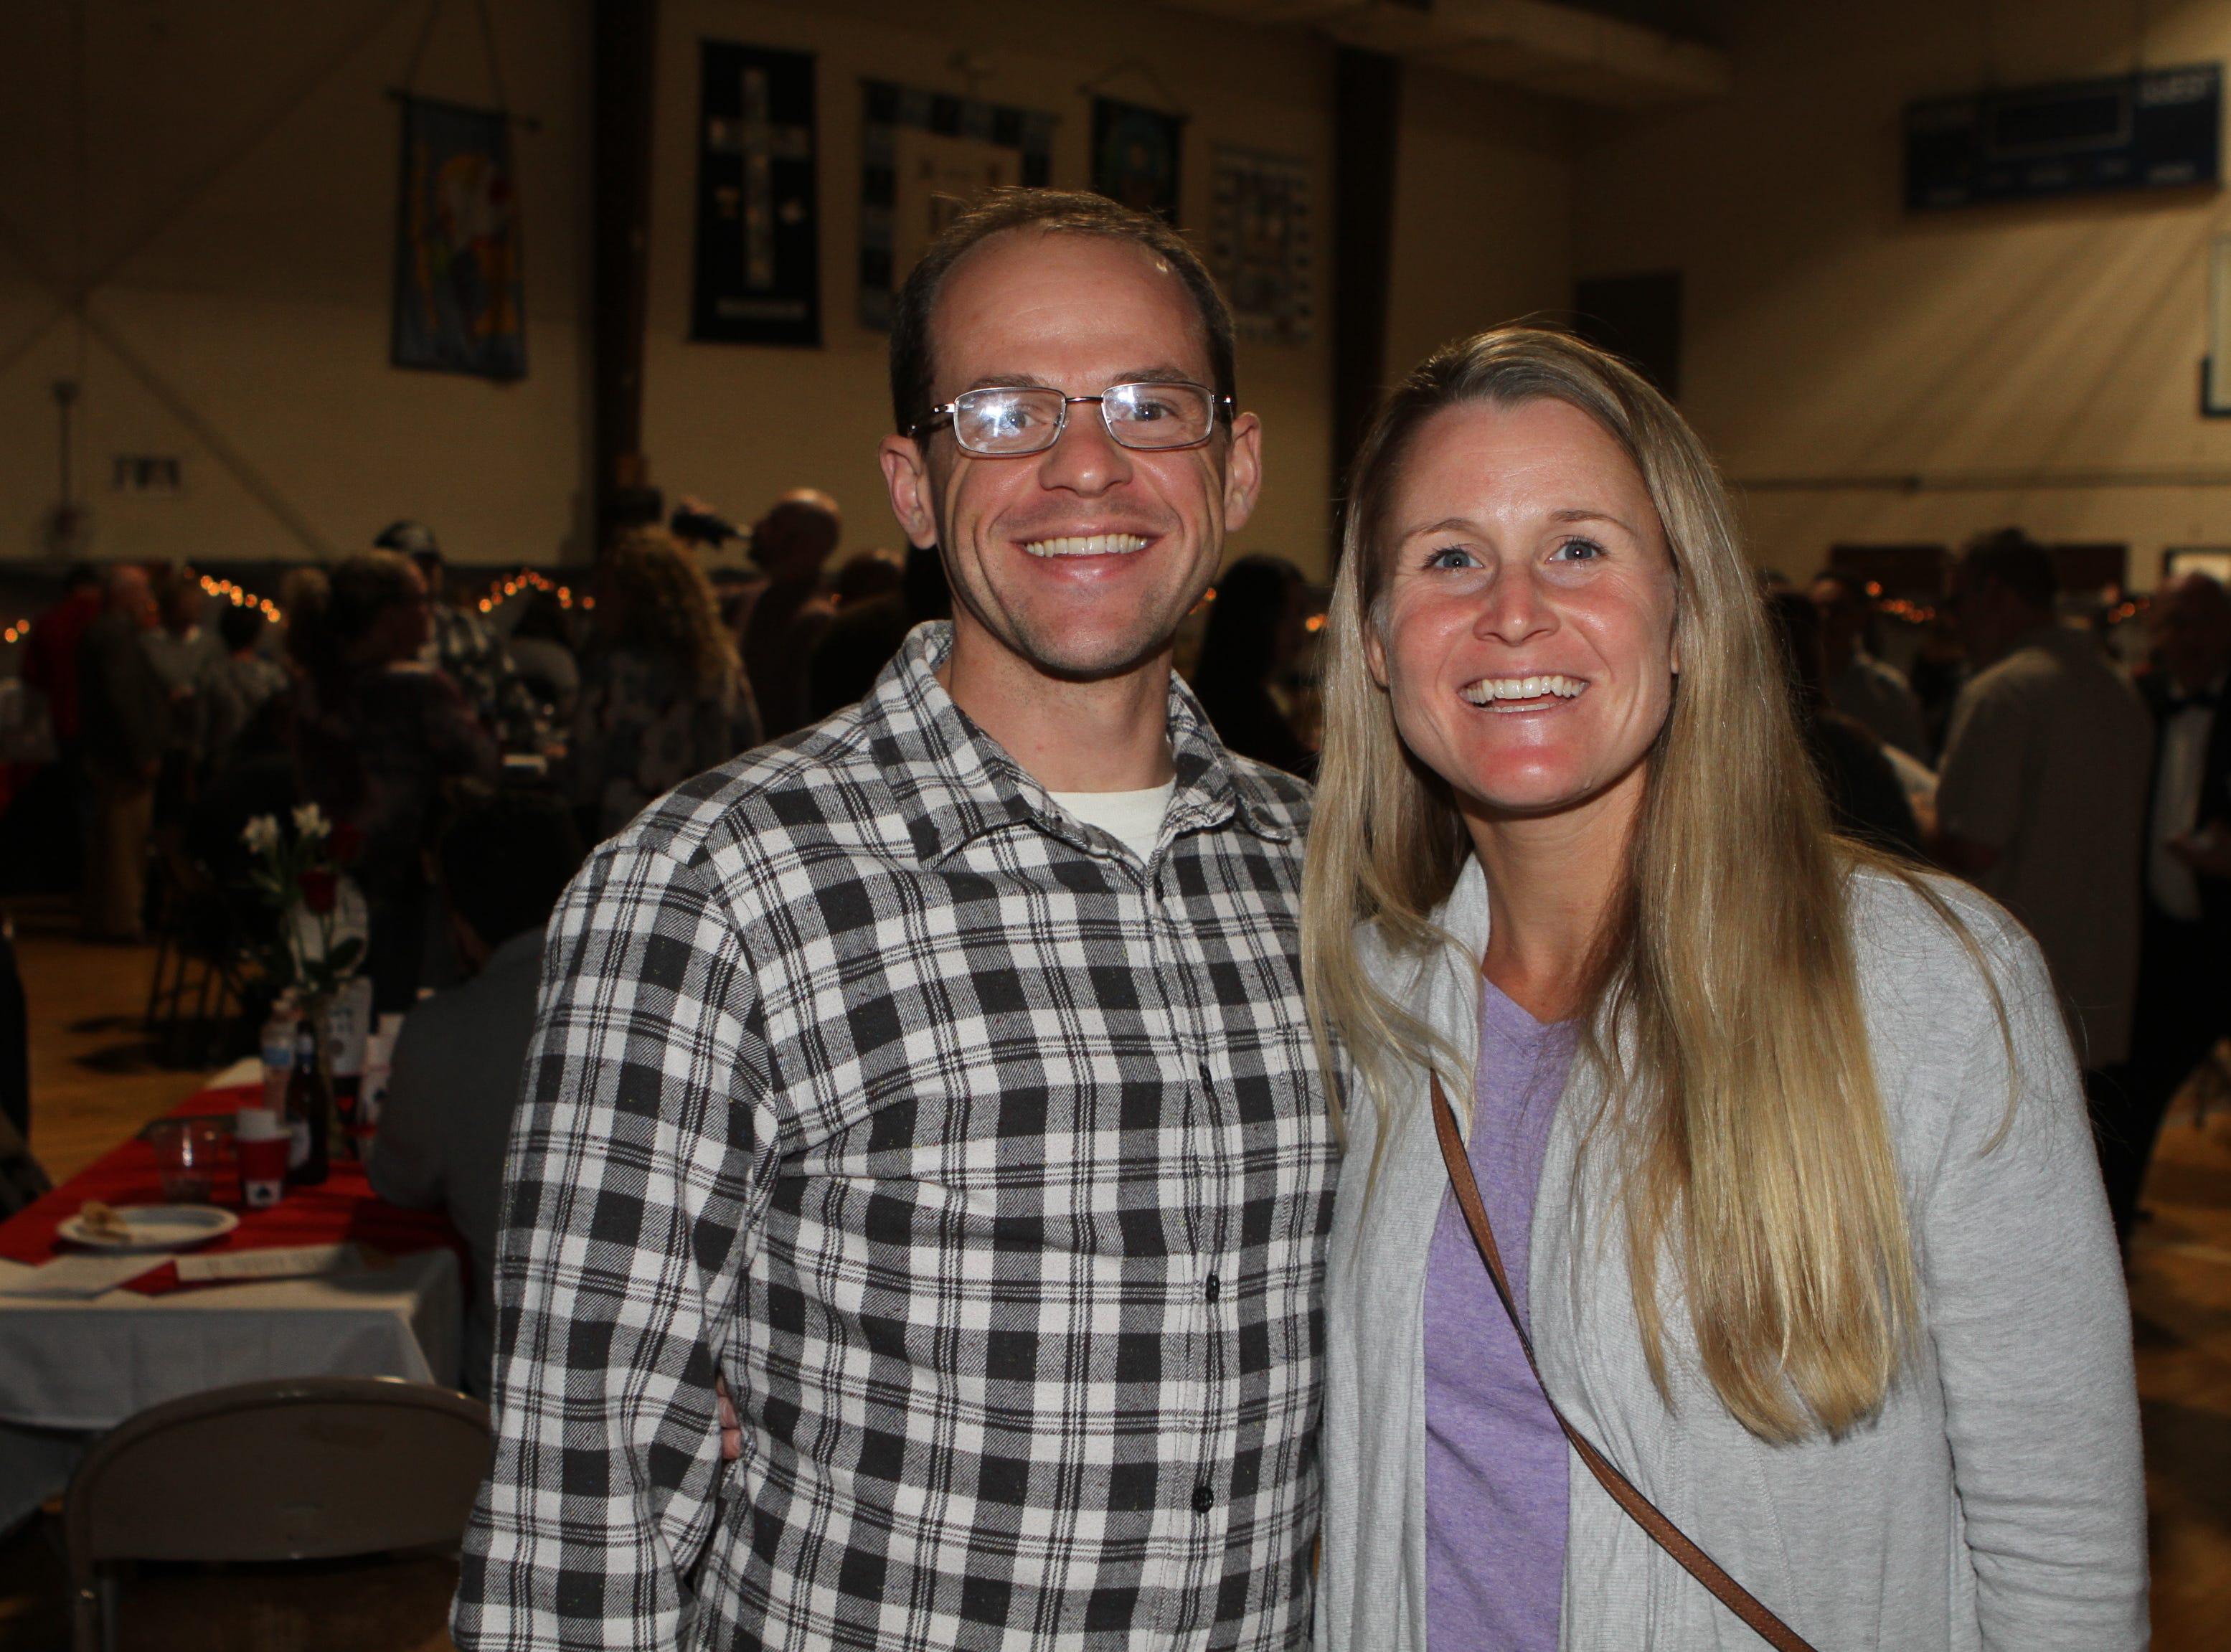 Josh and Kalea Lehman at Casino Night at Immaculate Conception School on Saturday, Nov. 3, 2018.